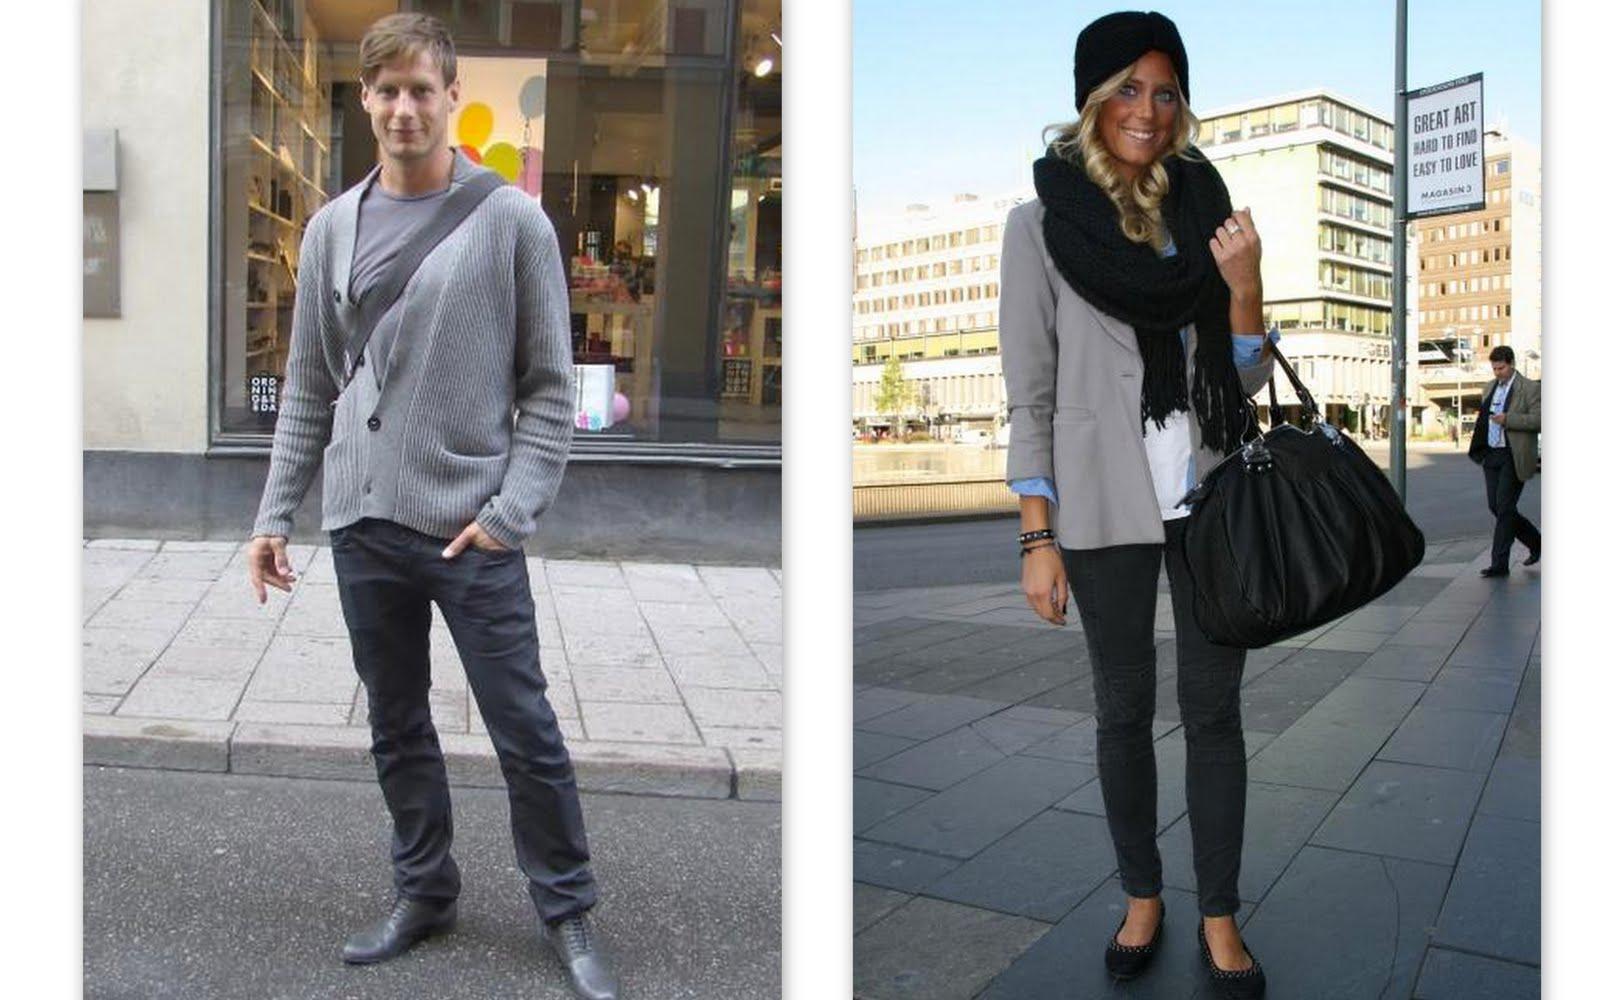 http://2.bp.blogspot.com/_K5LrjvM0n2M/S96wMqcv3wI/AAAAAAAAAHY/HGwmAQsC8UU/s1600/Miss%2BAu%2BCourant-Stockholm-Sweden-Style%2BInspiration-Fashion-Street%2BStyle-Men-Women.jpg